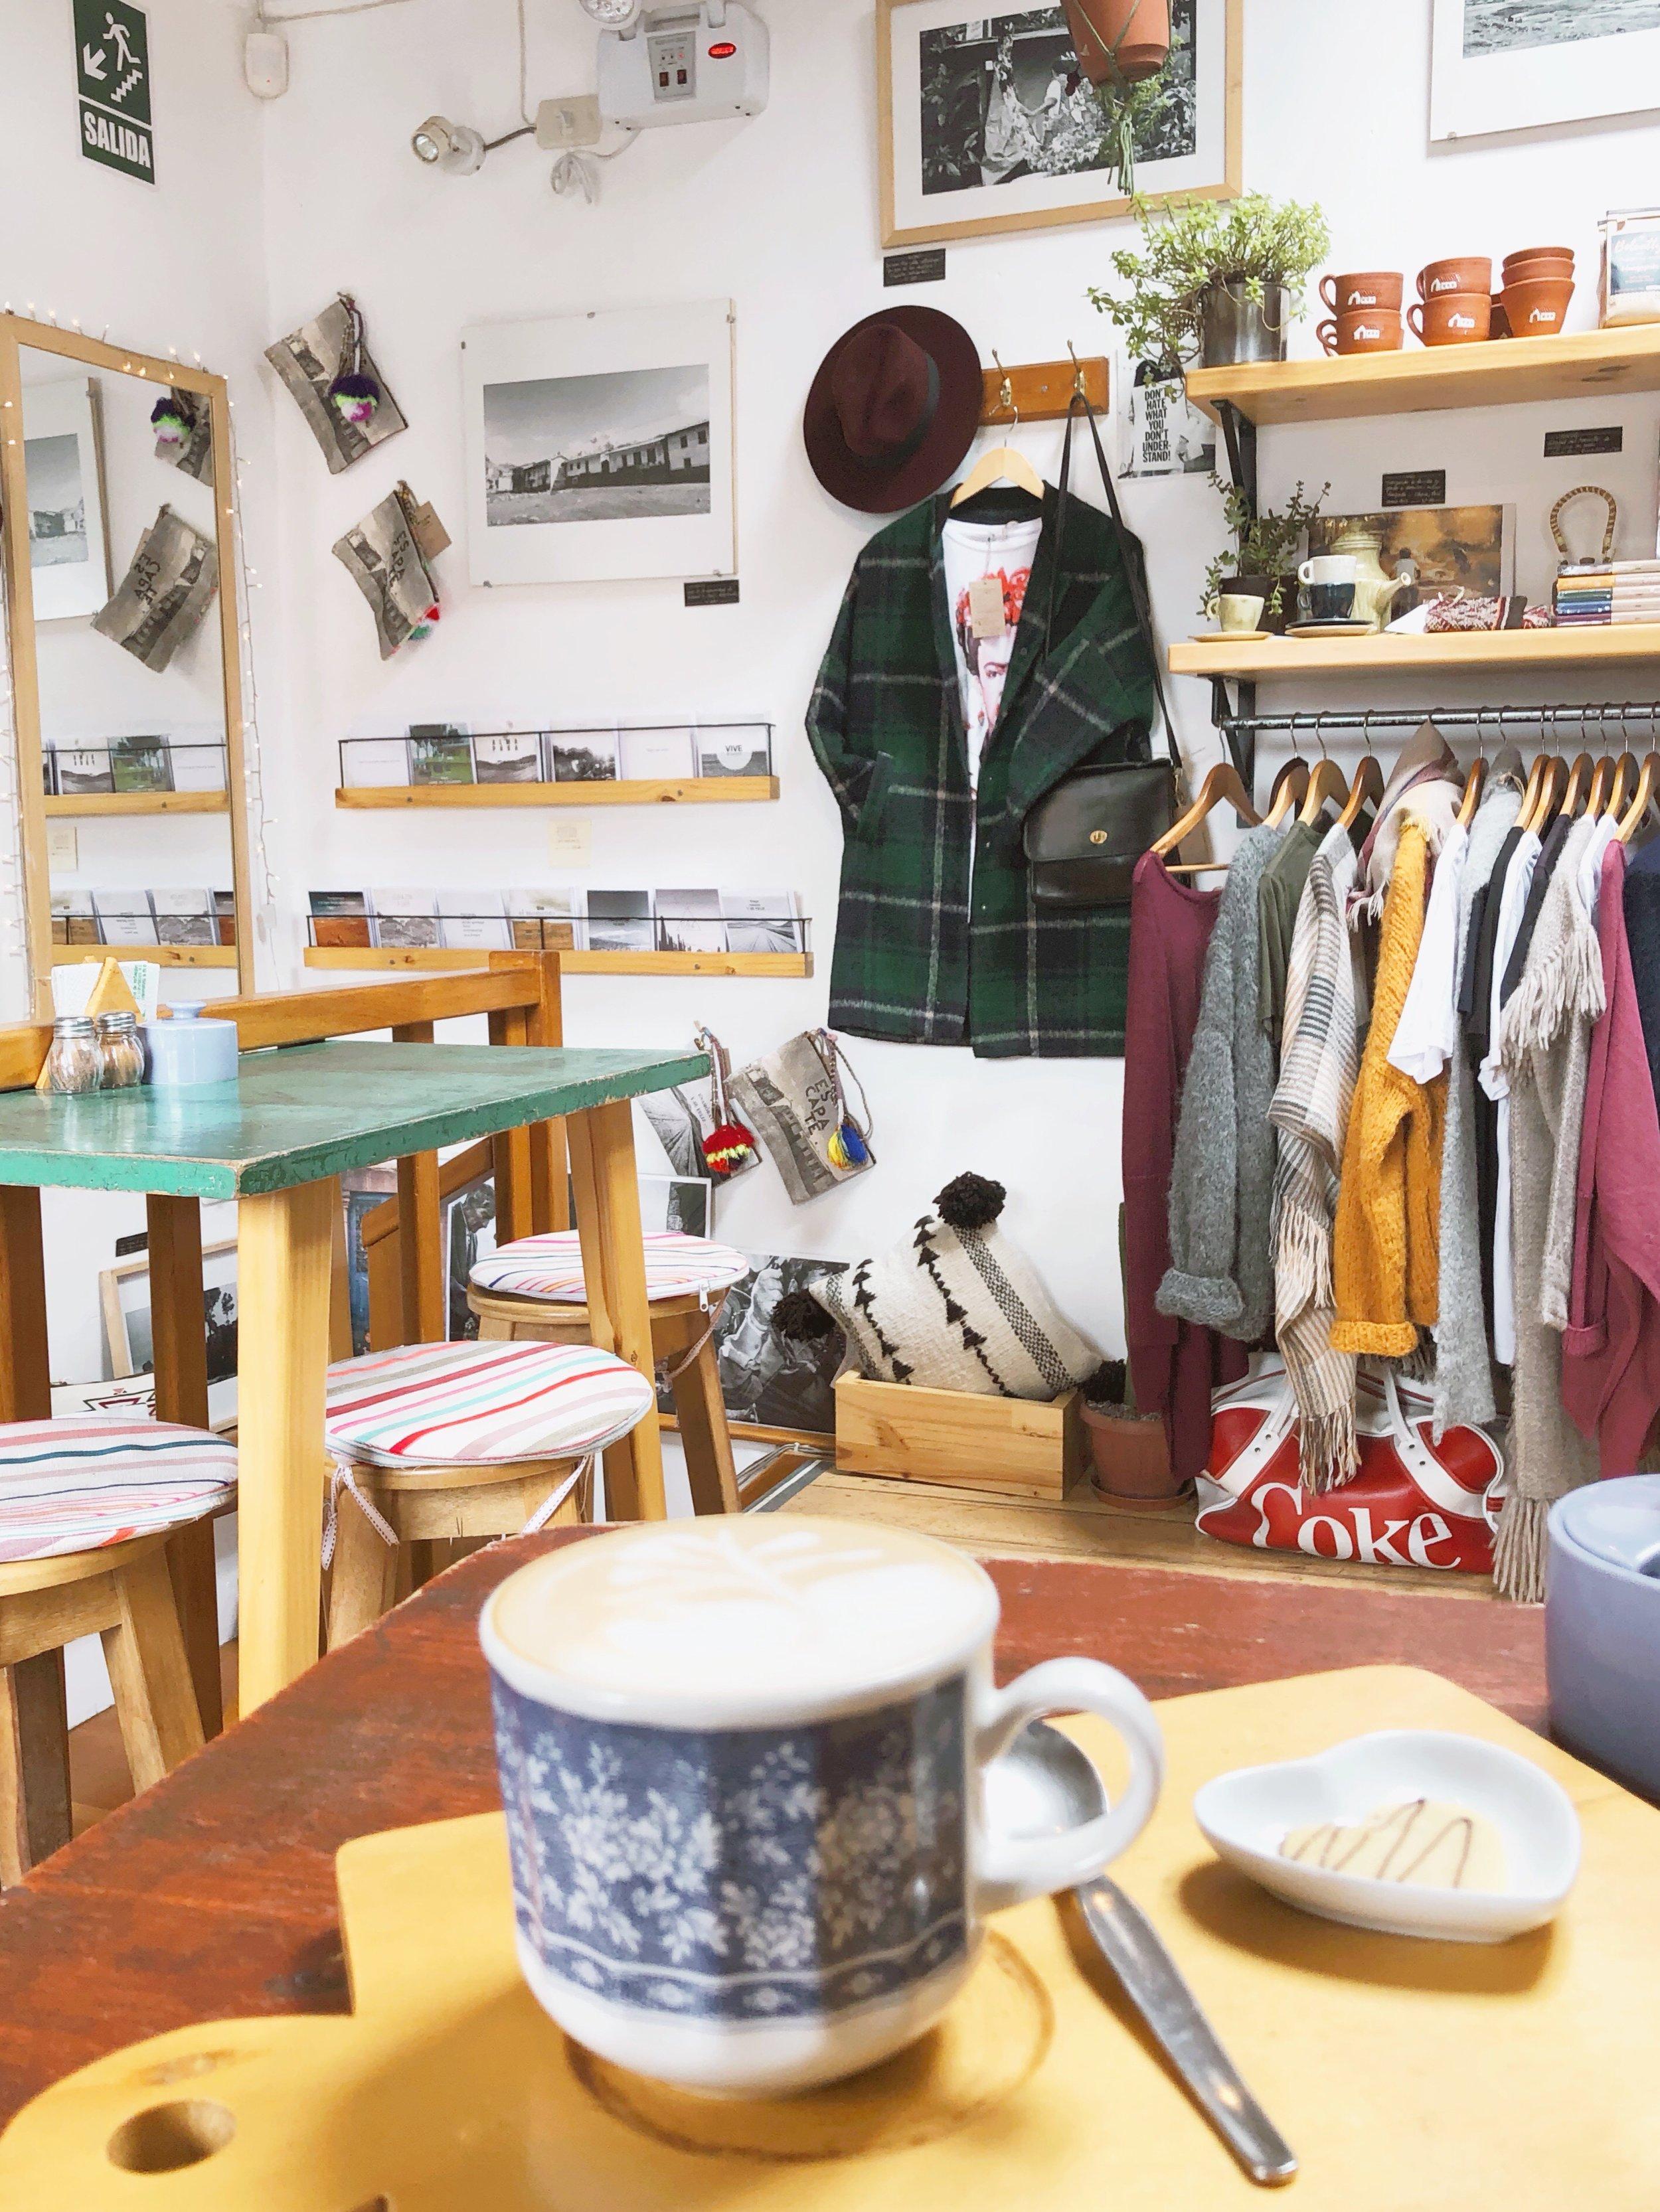 Cafe-cusco-peru-travel-tips